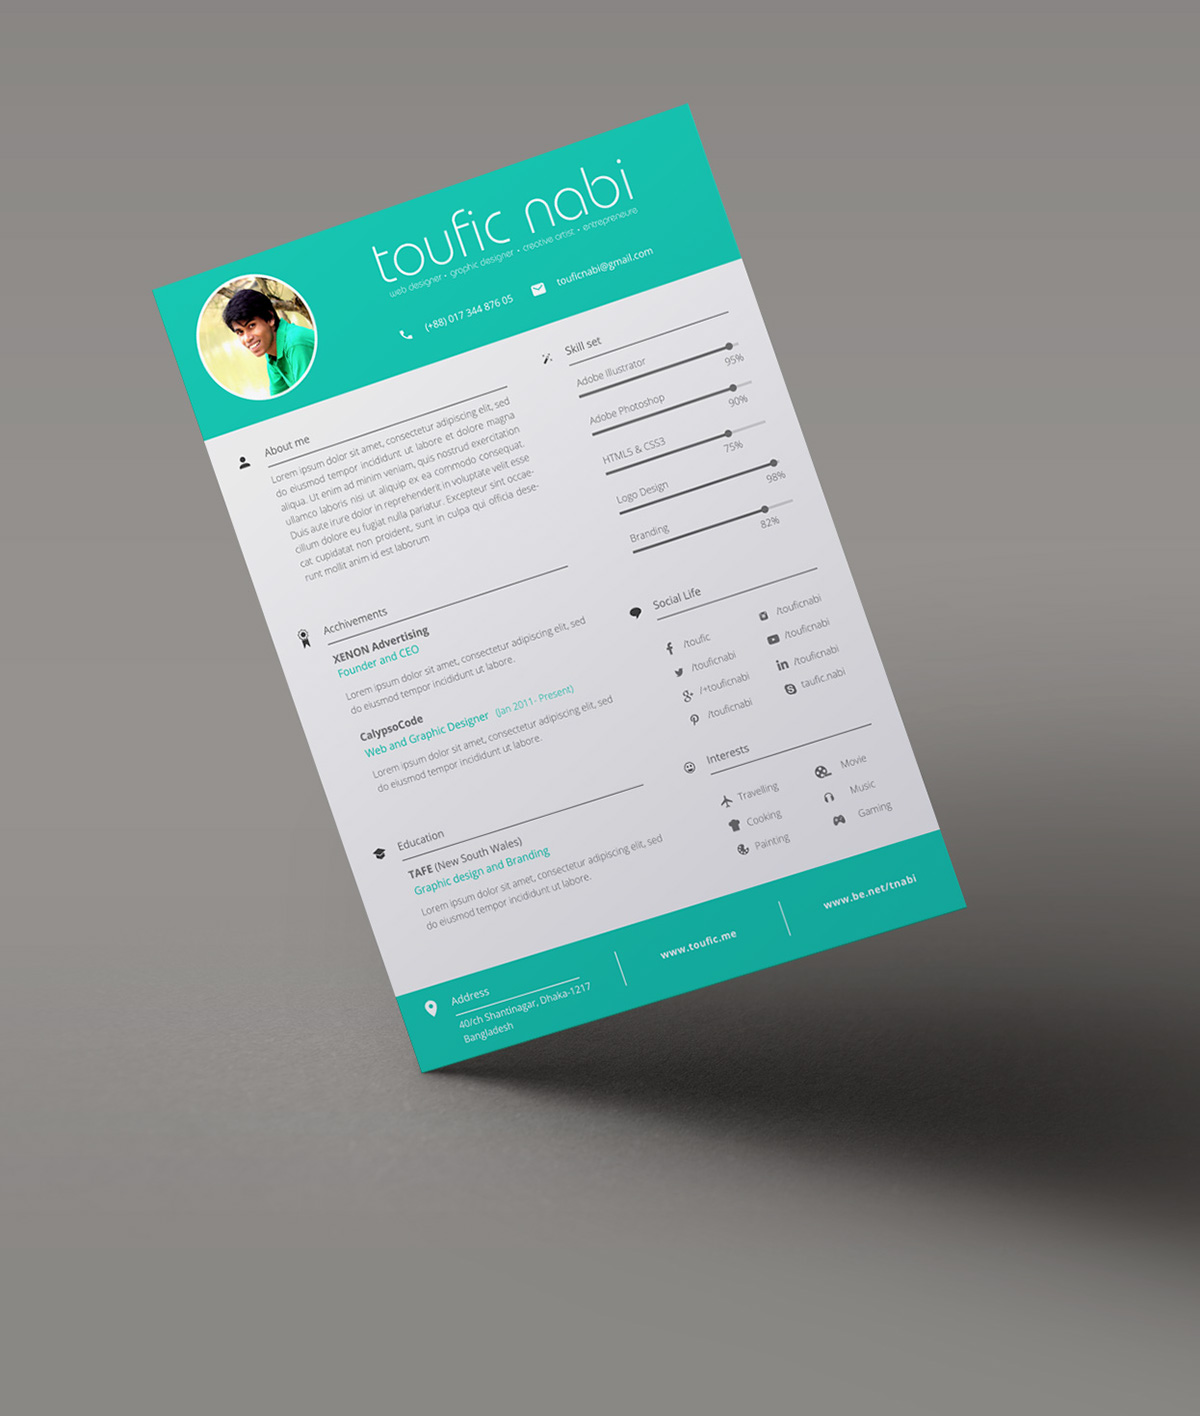 Resume,CV,colorful,designer,graphic,freebie,download,Personal Info,free,tamplate,Creative Resume,UI/UX Designer ,clean,modern,elegant